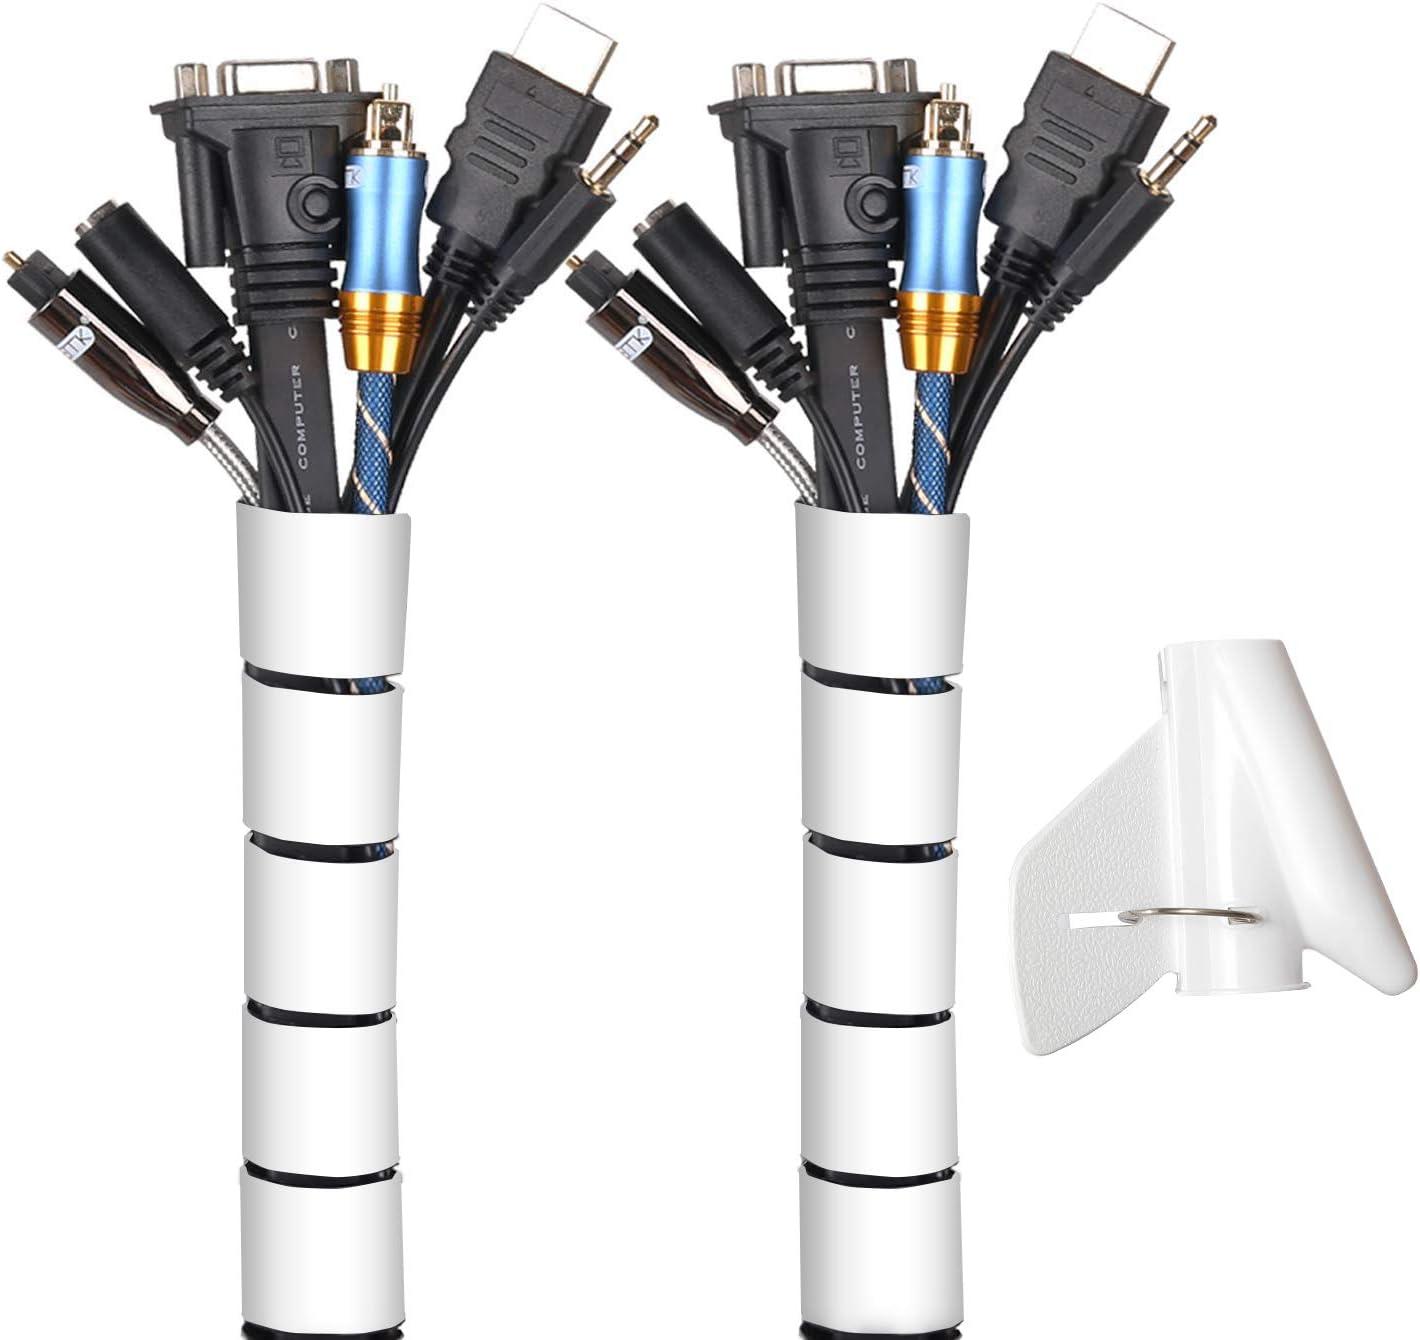 MOSOTECH Organizador Cables, Cubre Cables de 2 x 3m, Flexible Funda Organizador Cables, Organizador de Cables Mesa, Recoge Cables para Office y PC ...